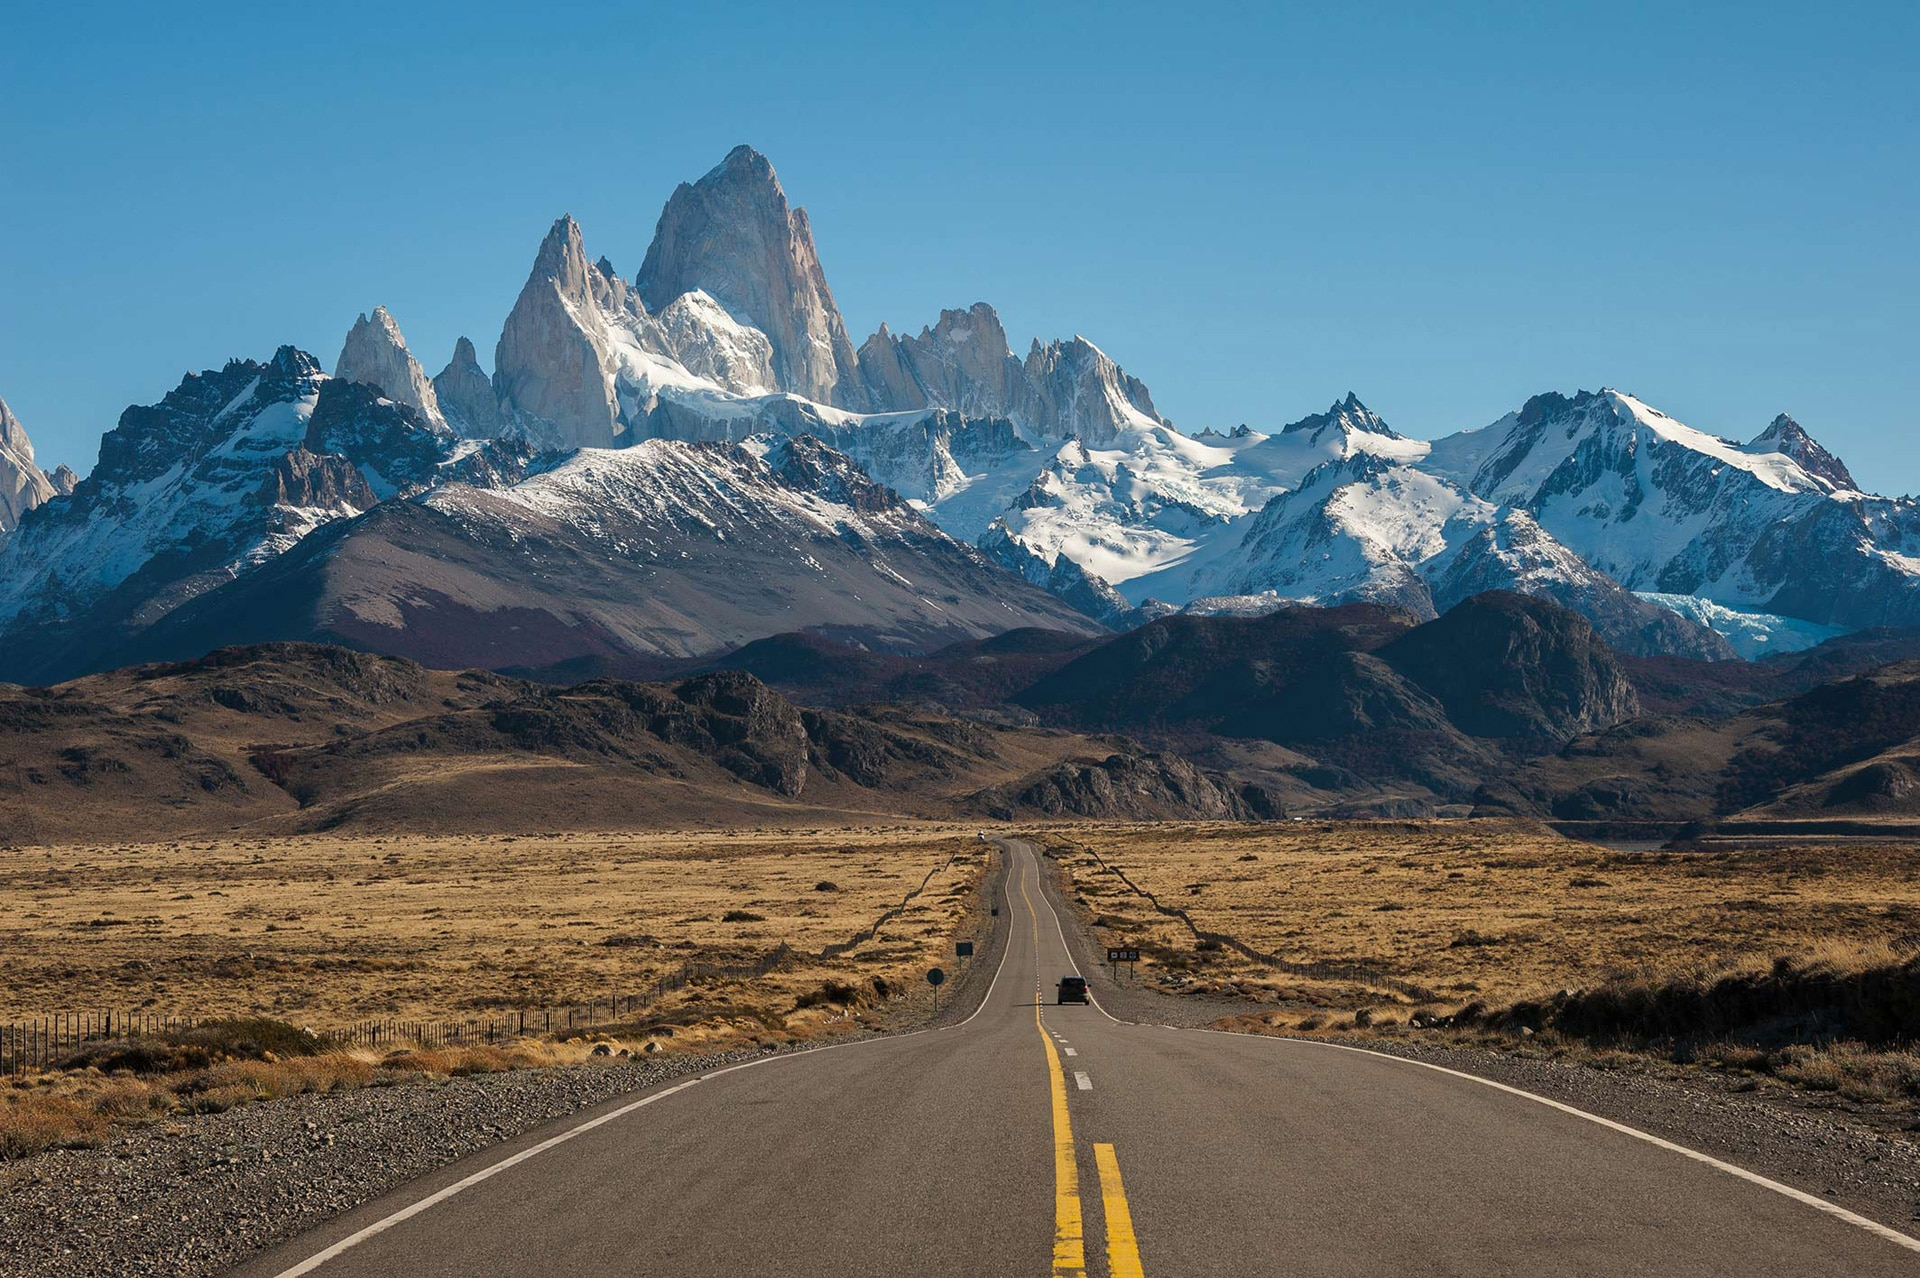 språkkurs spanska argentina